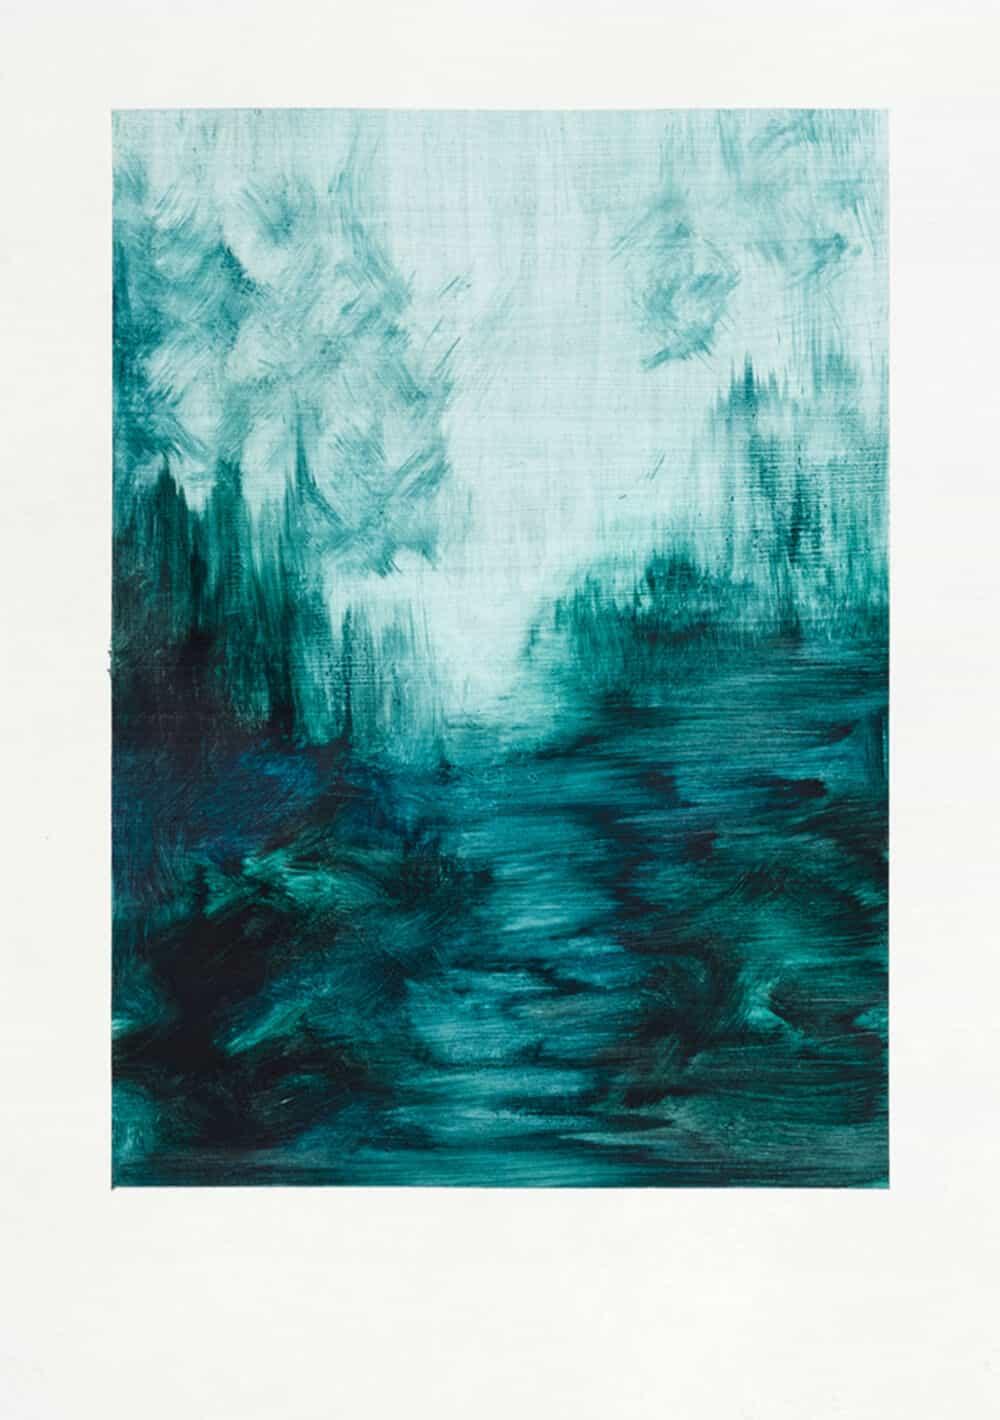 ZARAH CASSIM. Way. Oil on paper. 250 x 205mm. Framed